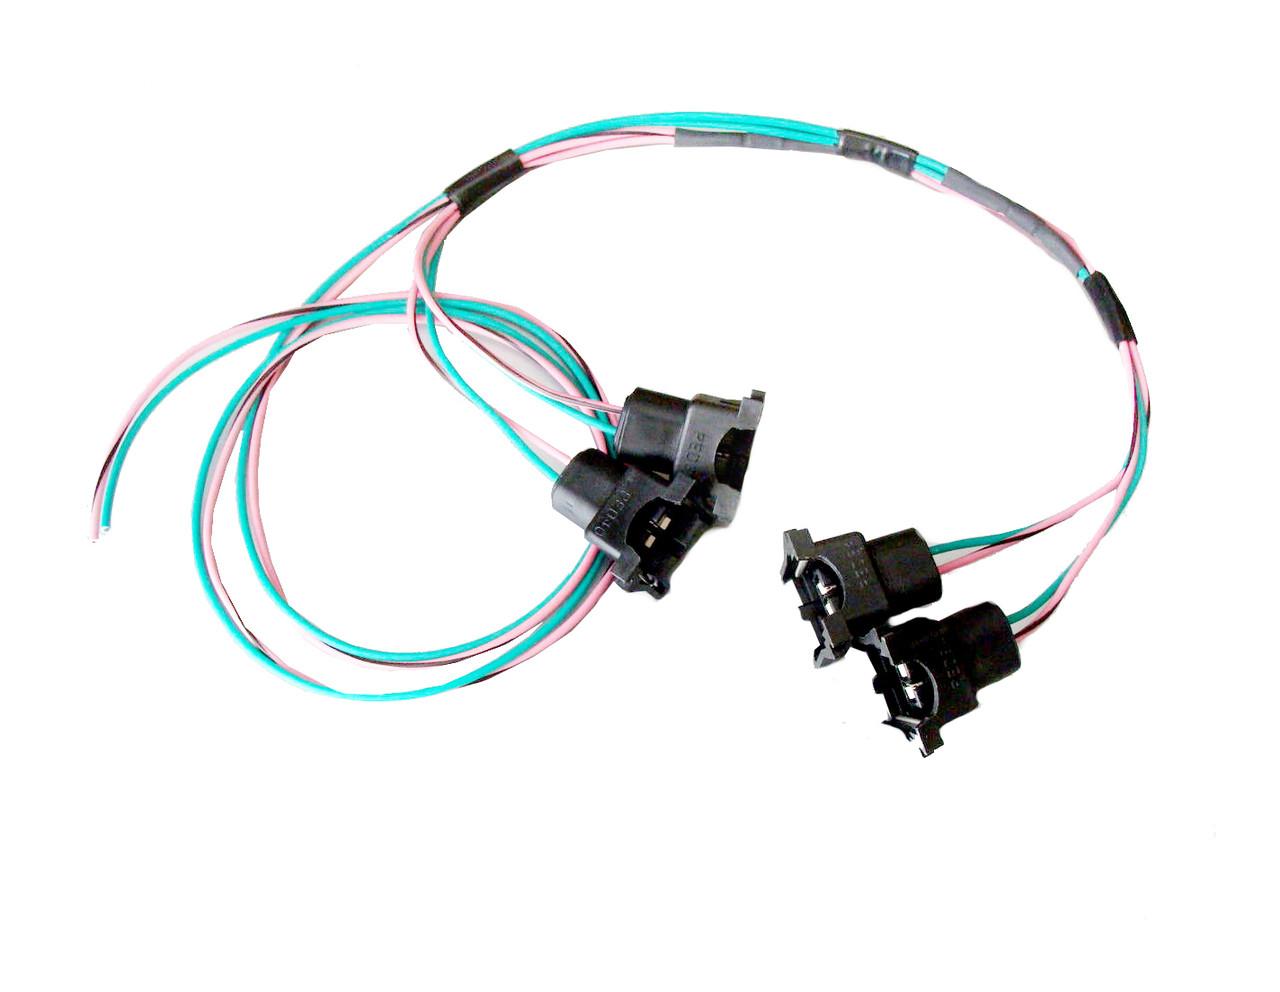 Lt1 V8 Fuel Injector Harness Data Wiring 1119 X 1537 Gif 639kb Diagram Carburetor Schema For Tecumseh 85 95 Tpi Connector Assembly Lh Rh Hawksmotorsports Com Ls1 Injectors Top Red